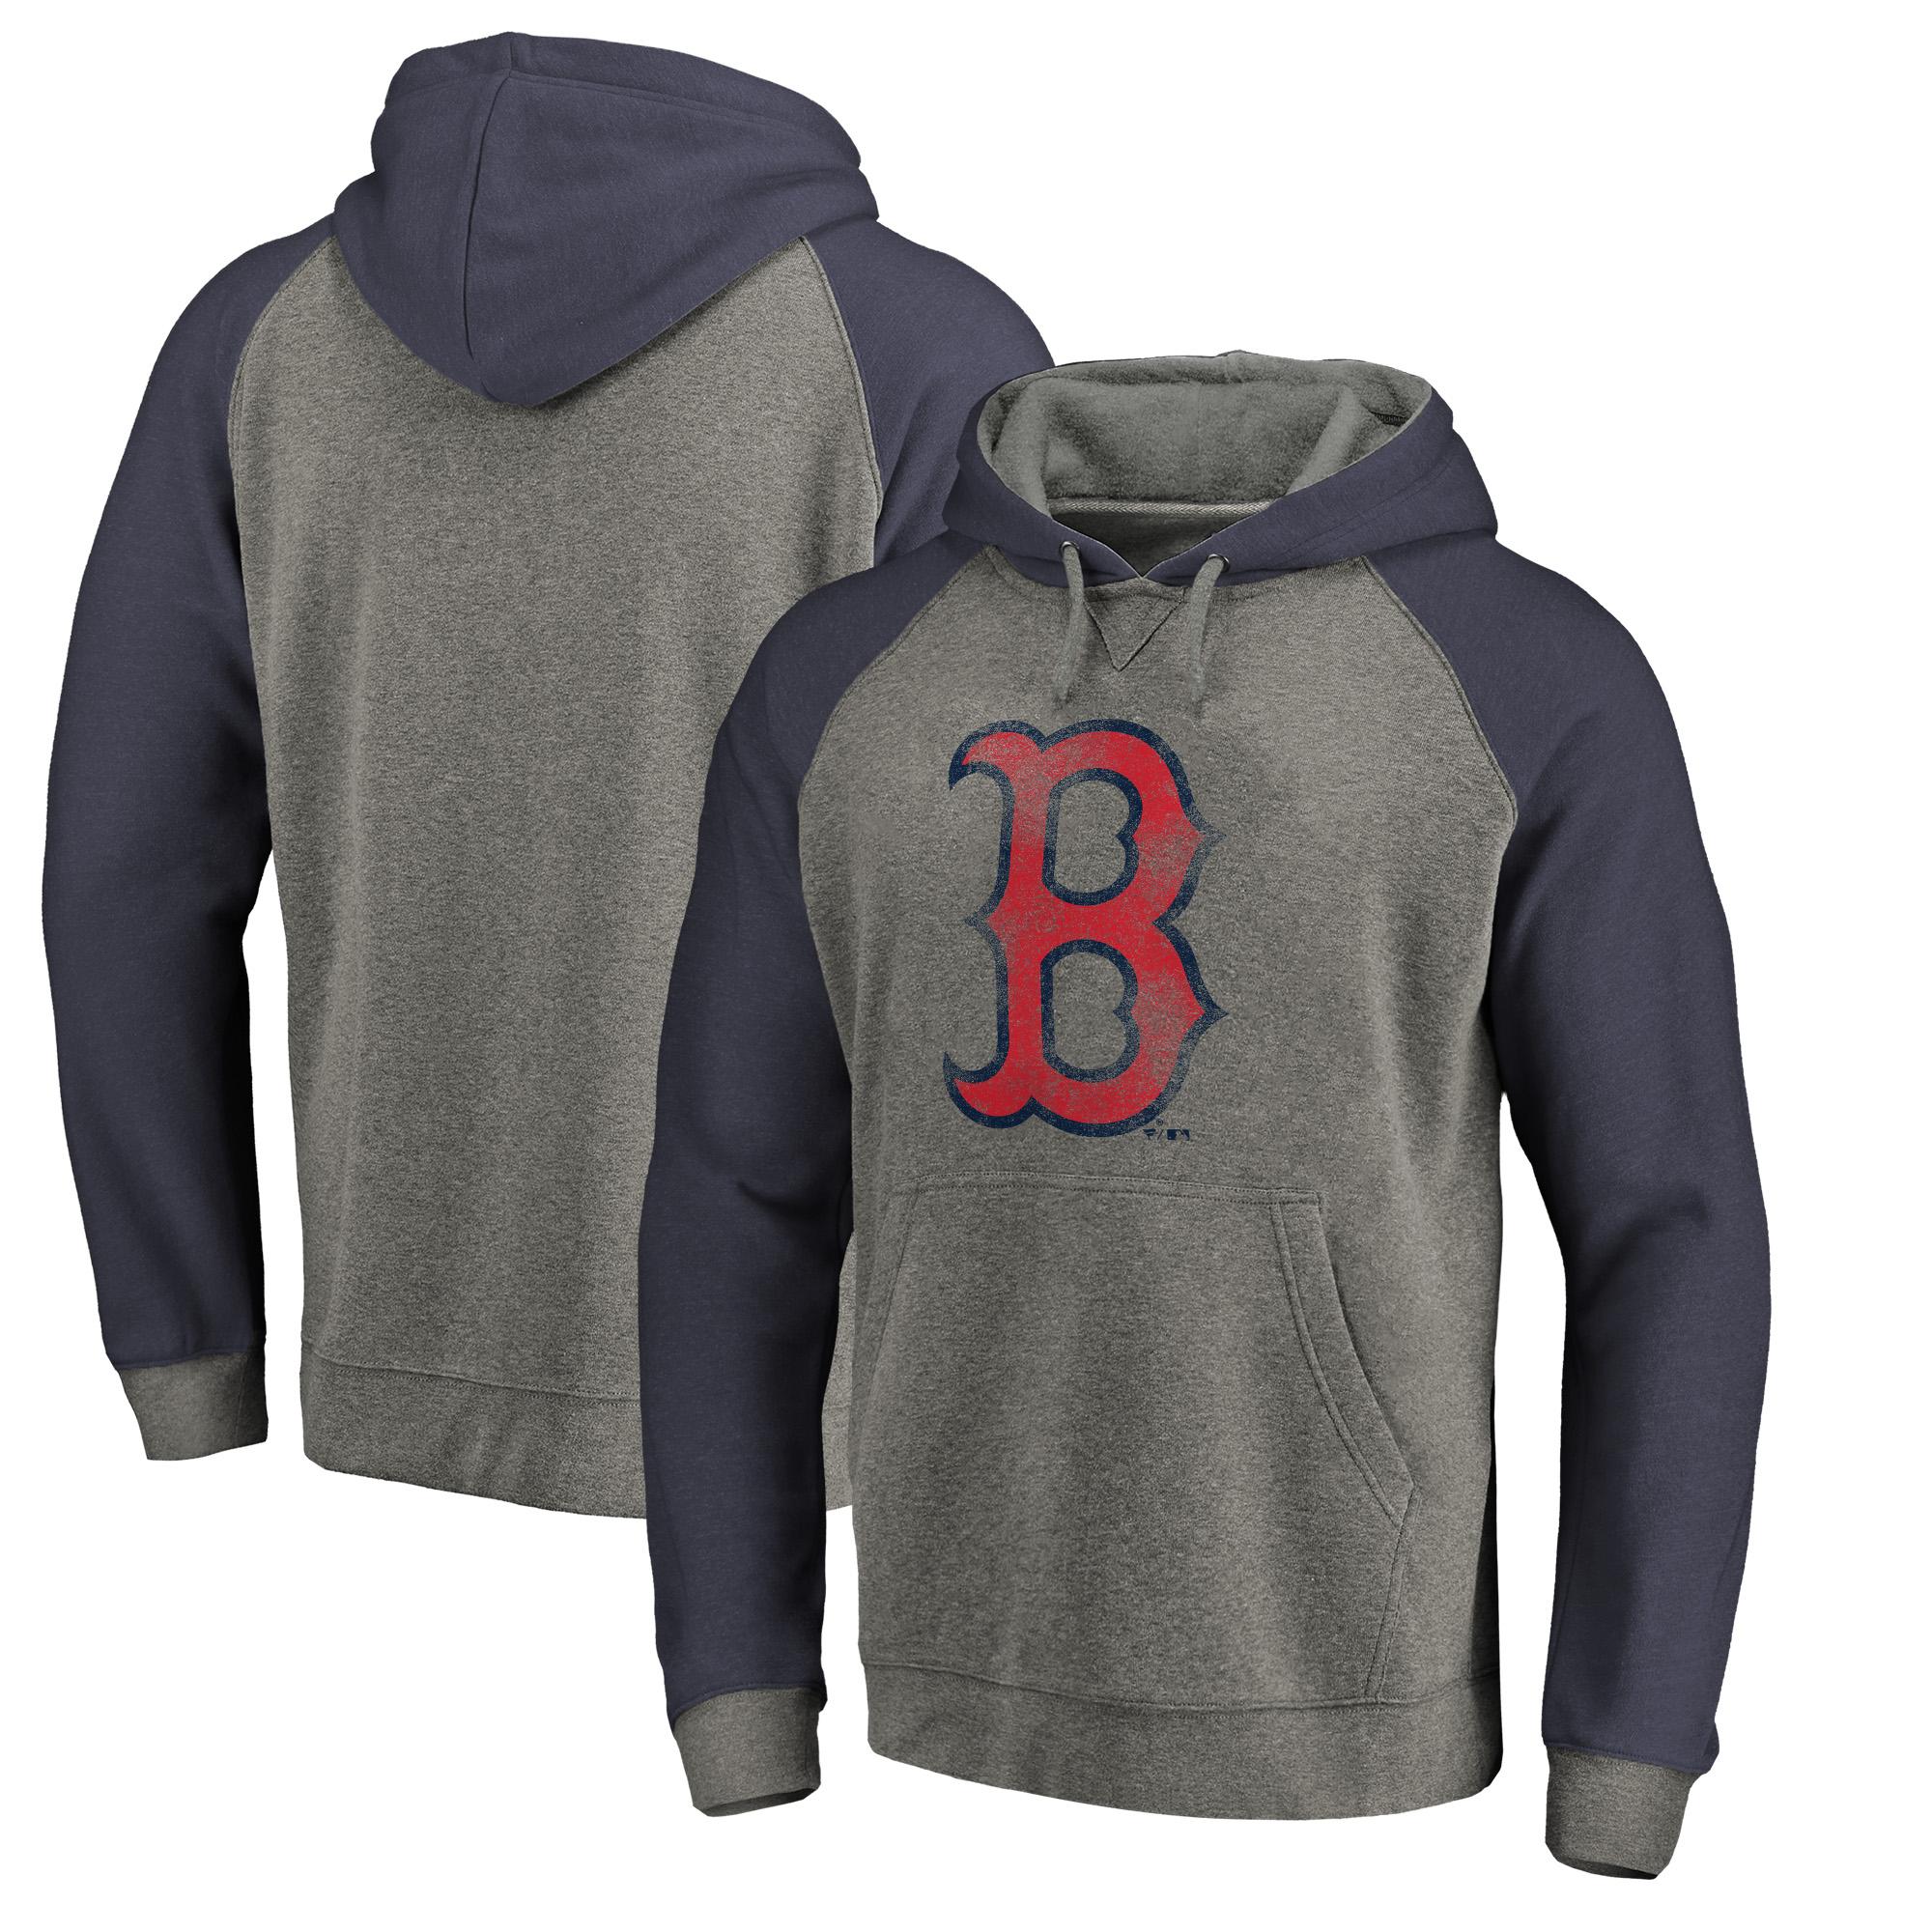 Boston Red Sox Fanatics Branded Distressed Team Logo Tri-Blend Big & Tall Raglan Pullover Hoodie - Gray/Navy